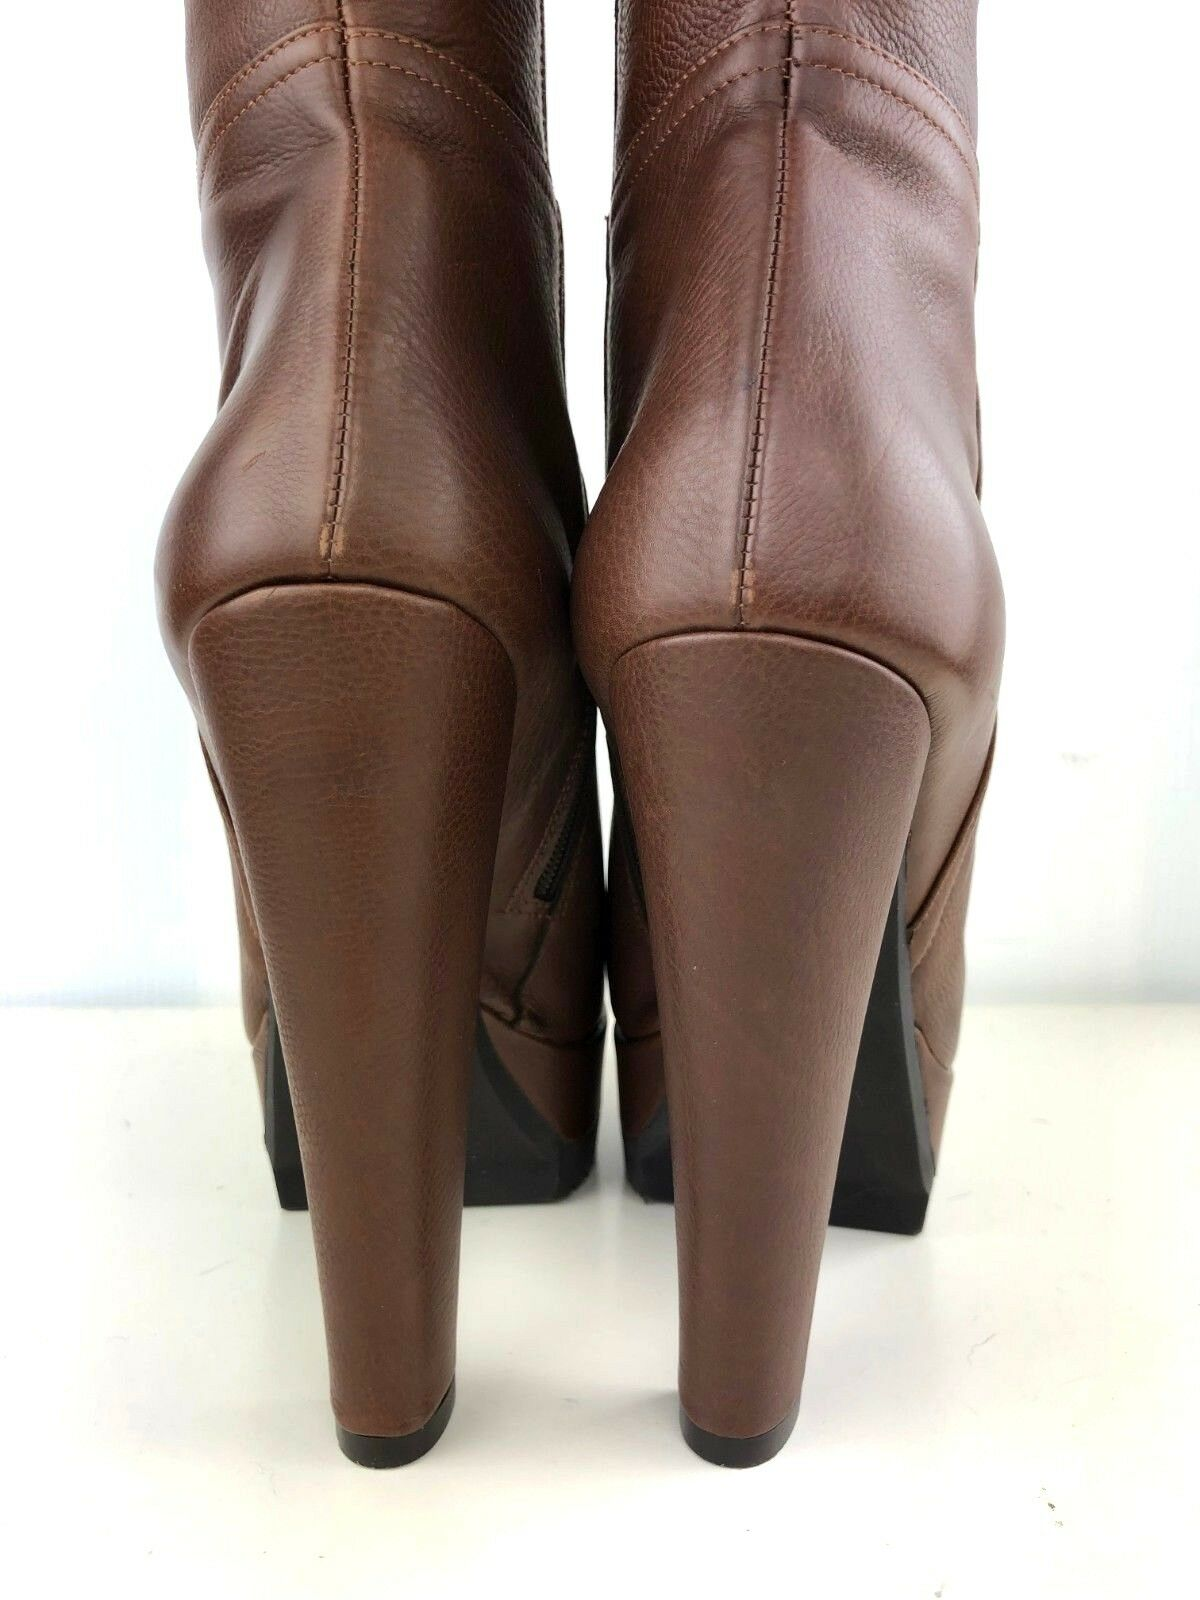 botas botas botas ITALY PLATFORM NEW REAL LEATHER FUR FUR FUR MINK marrón marrón 37 d3f3bc